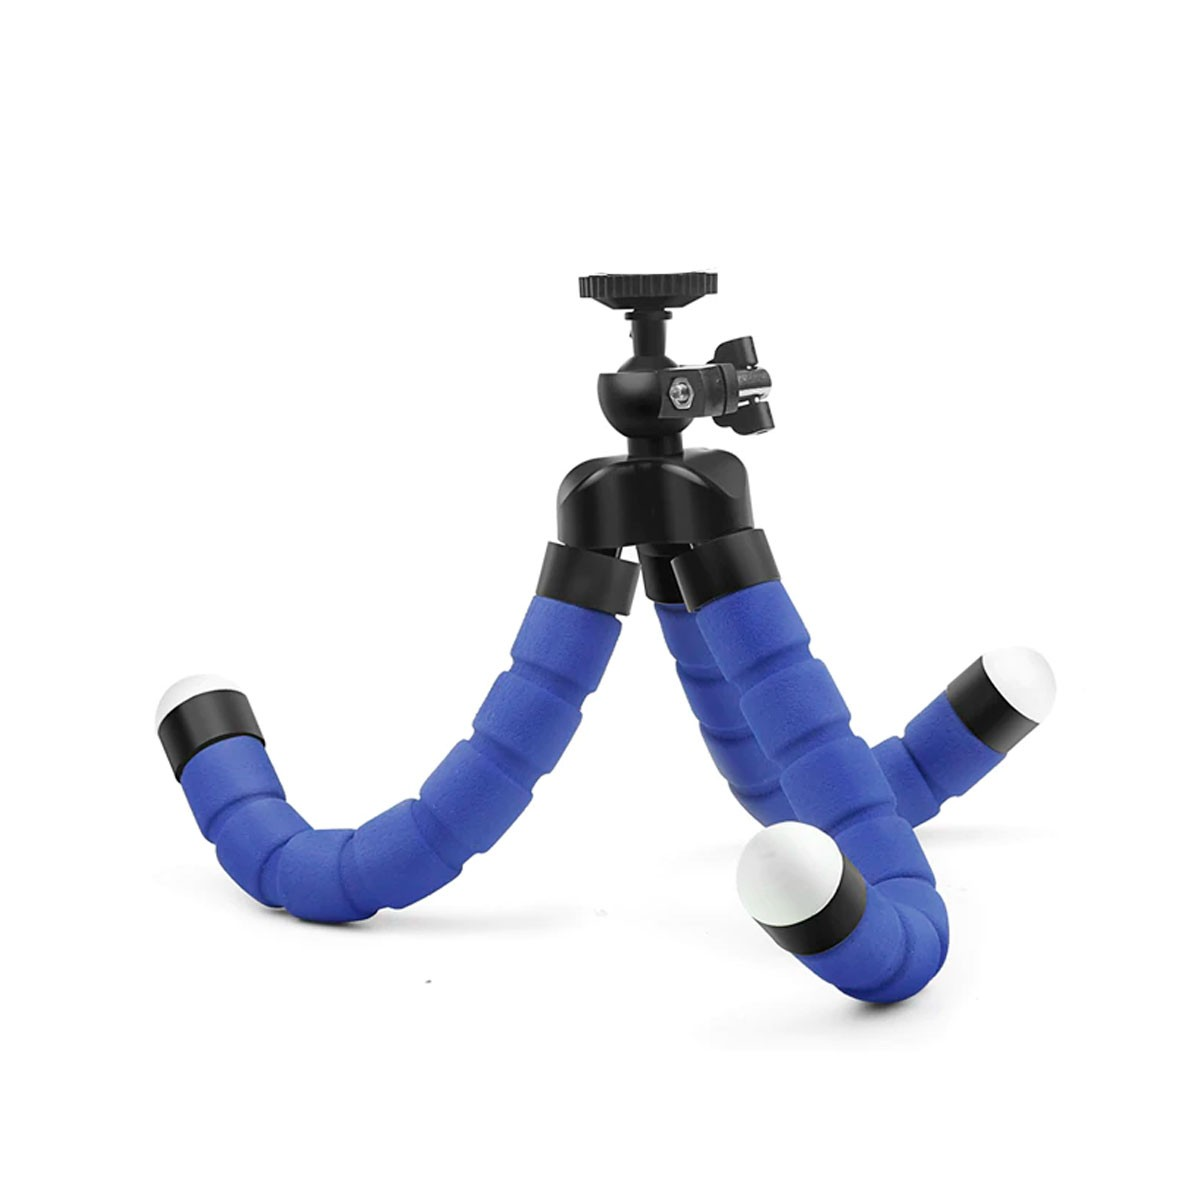 Tripé Flexível Esponja 17cm - Octopus Gorillapod - GoPro SJCAM Eken Yi